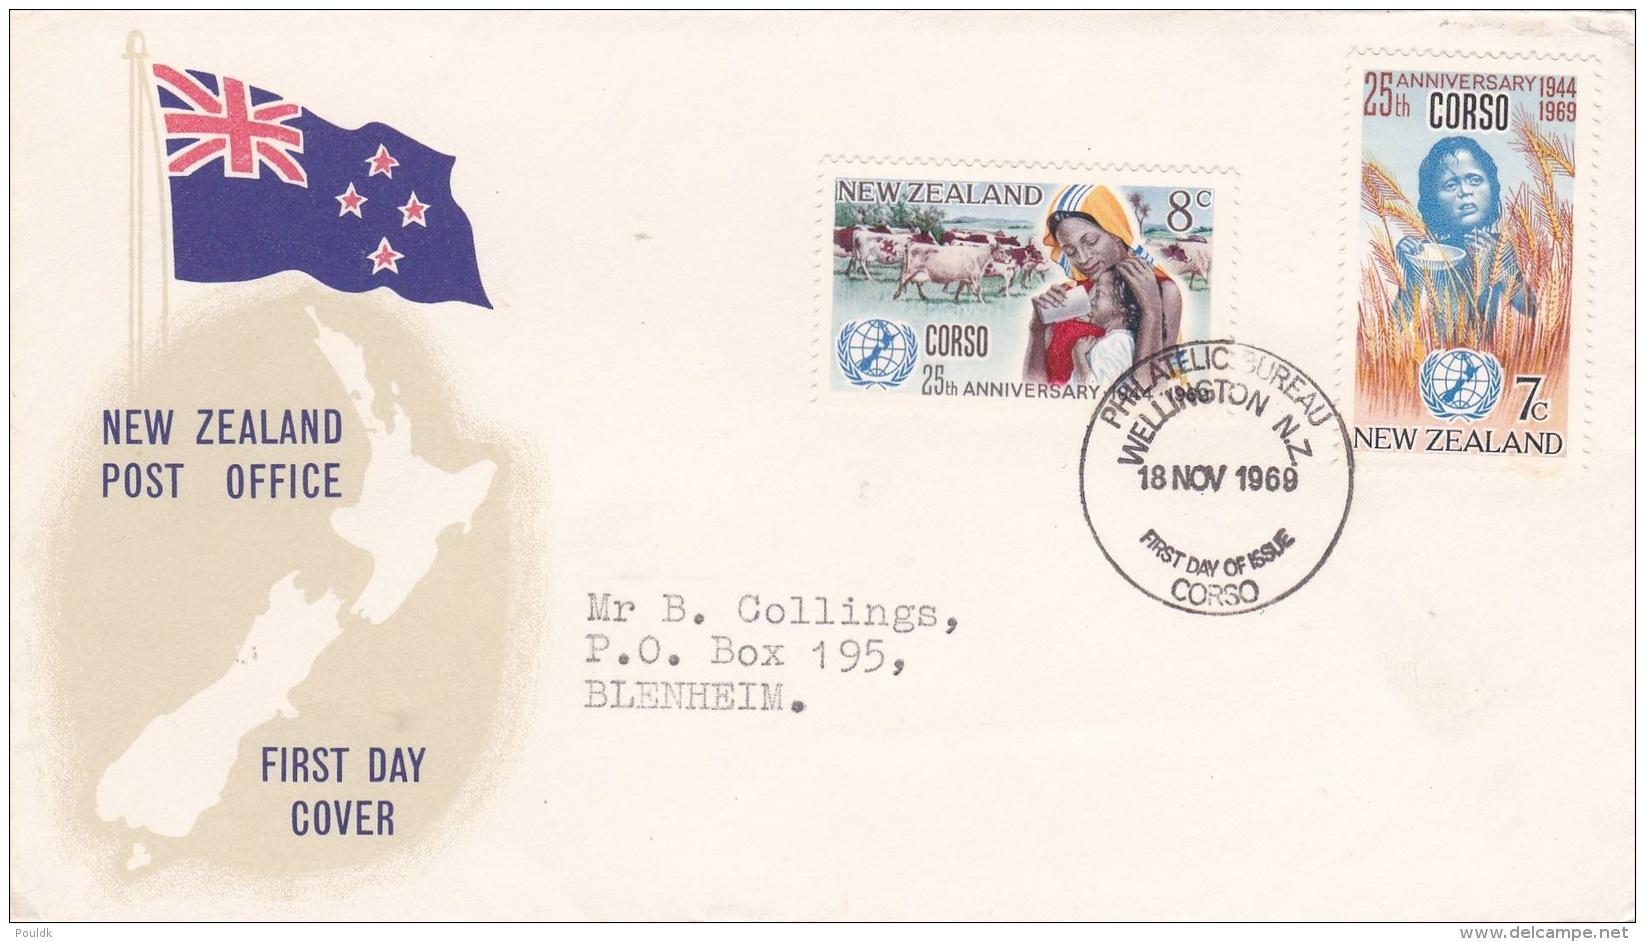 New Zealand FDC 1969 CORSO  (G86-44) - FDC